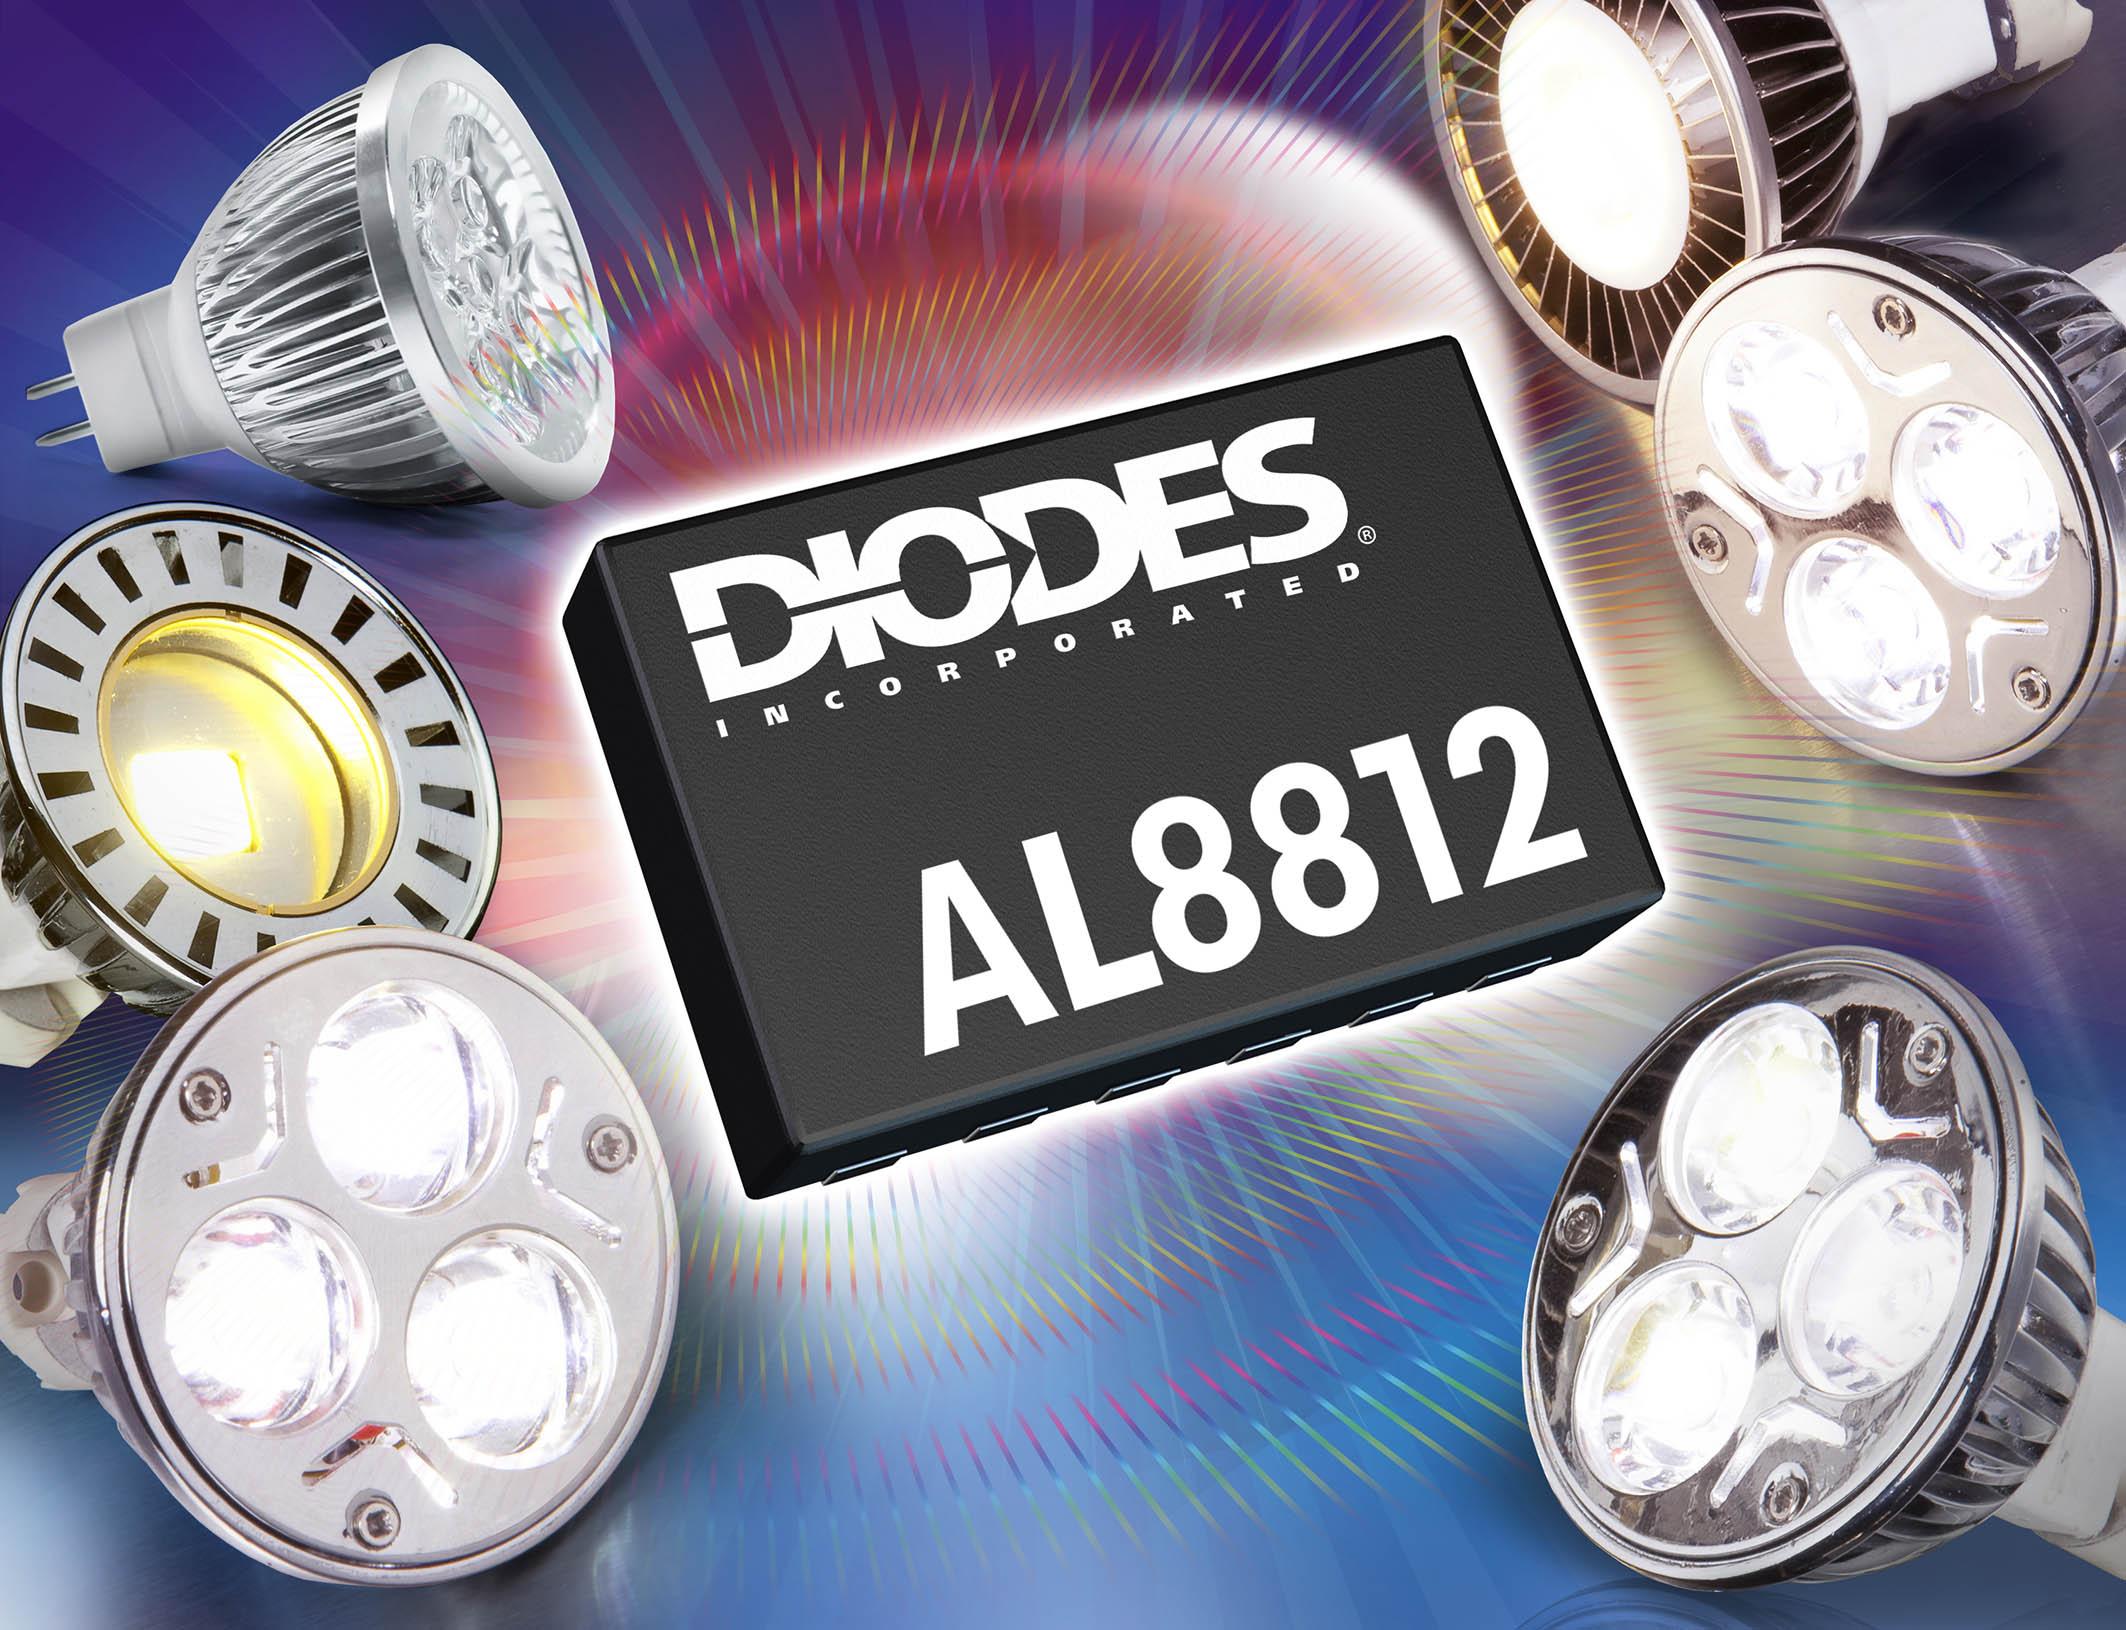 Diodes高功率因数升压LED驱动器,有效缩减可调光MR16 LED灯电路占位面积